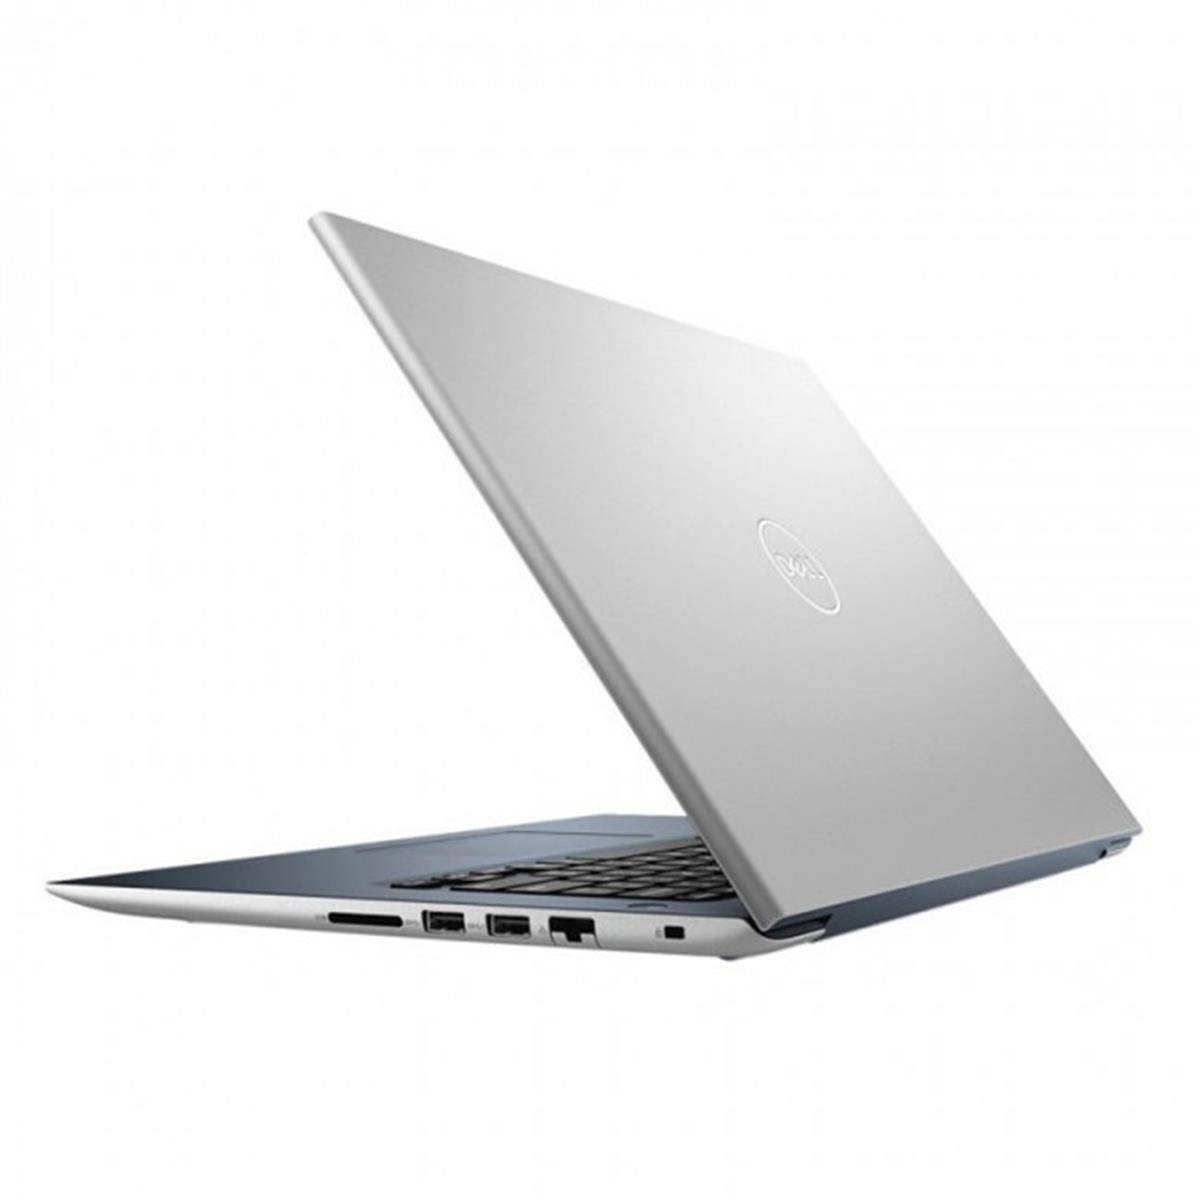 Laptop Professional Dell 14 5471 i5 4Ram Win 10 Pro